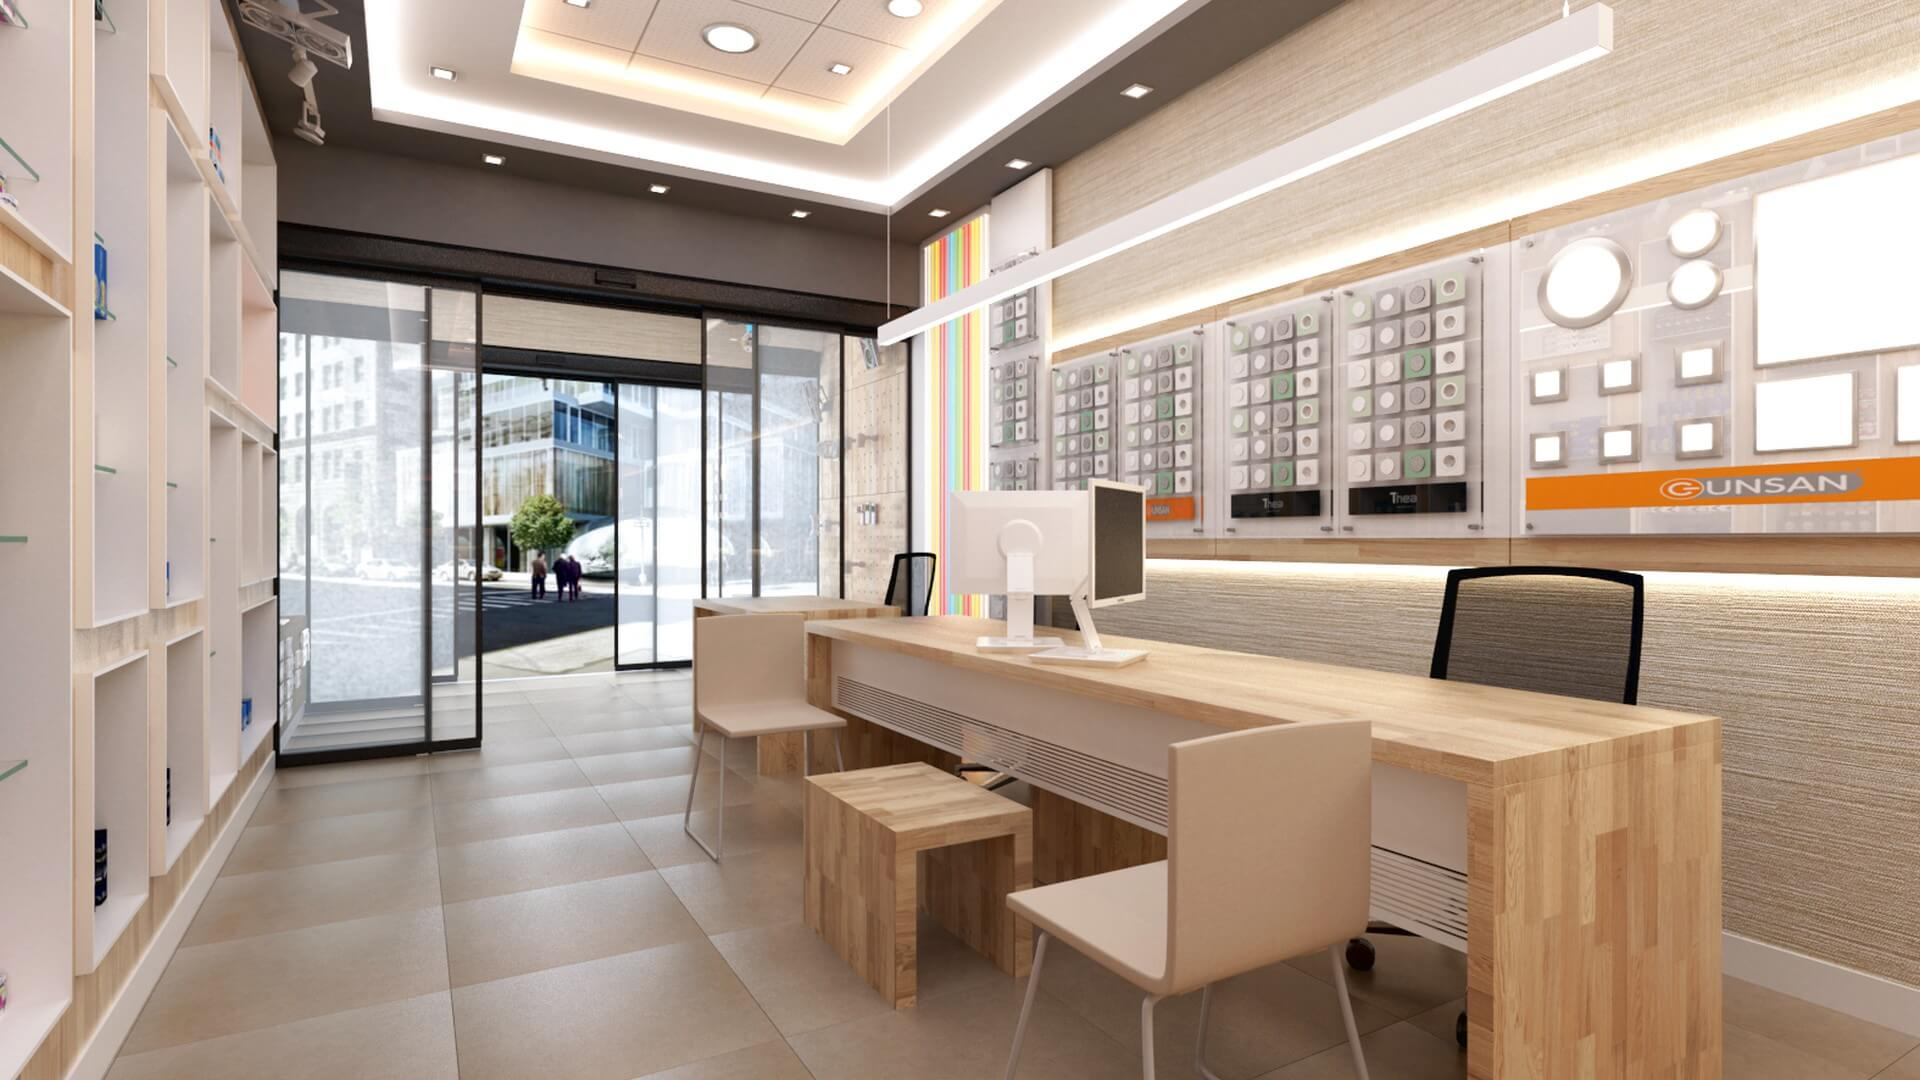 Retail Shop Design Interior Architecture Yetven Electric / Ulus